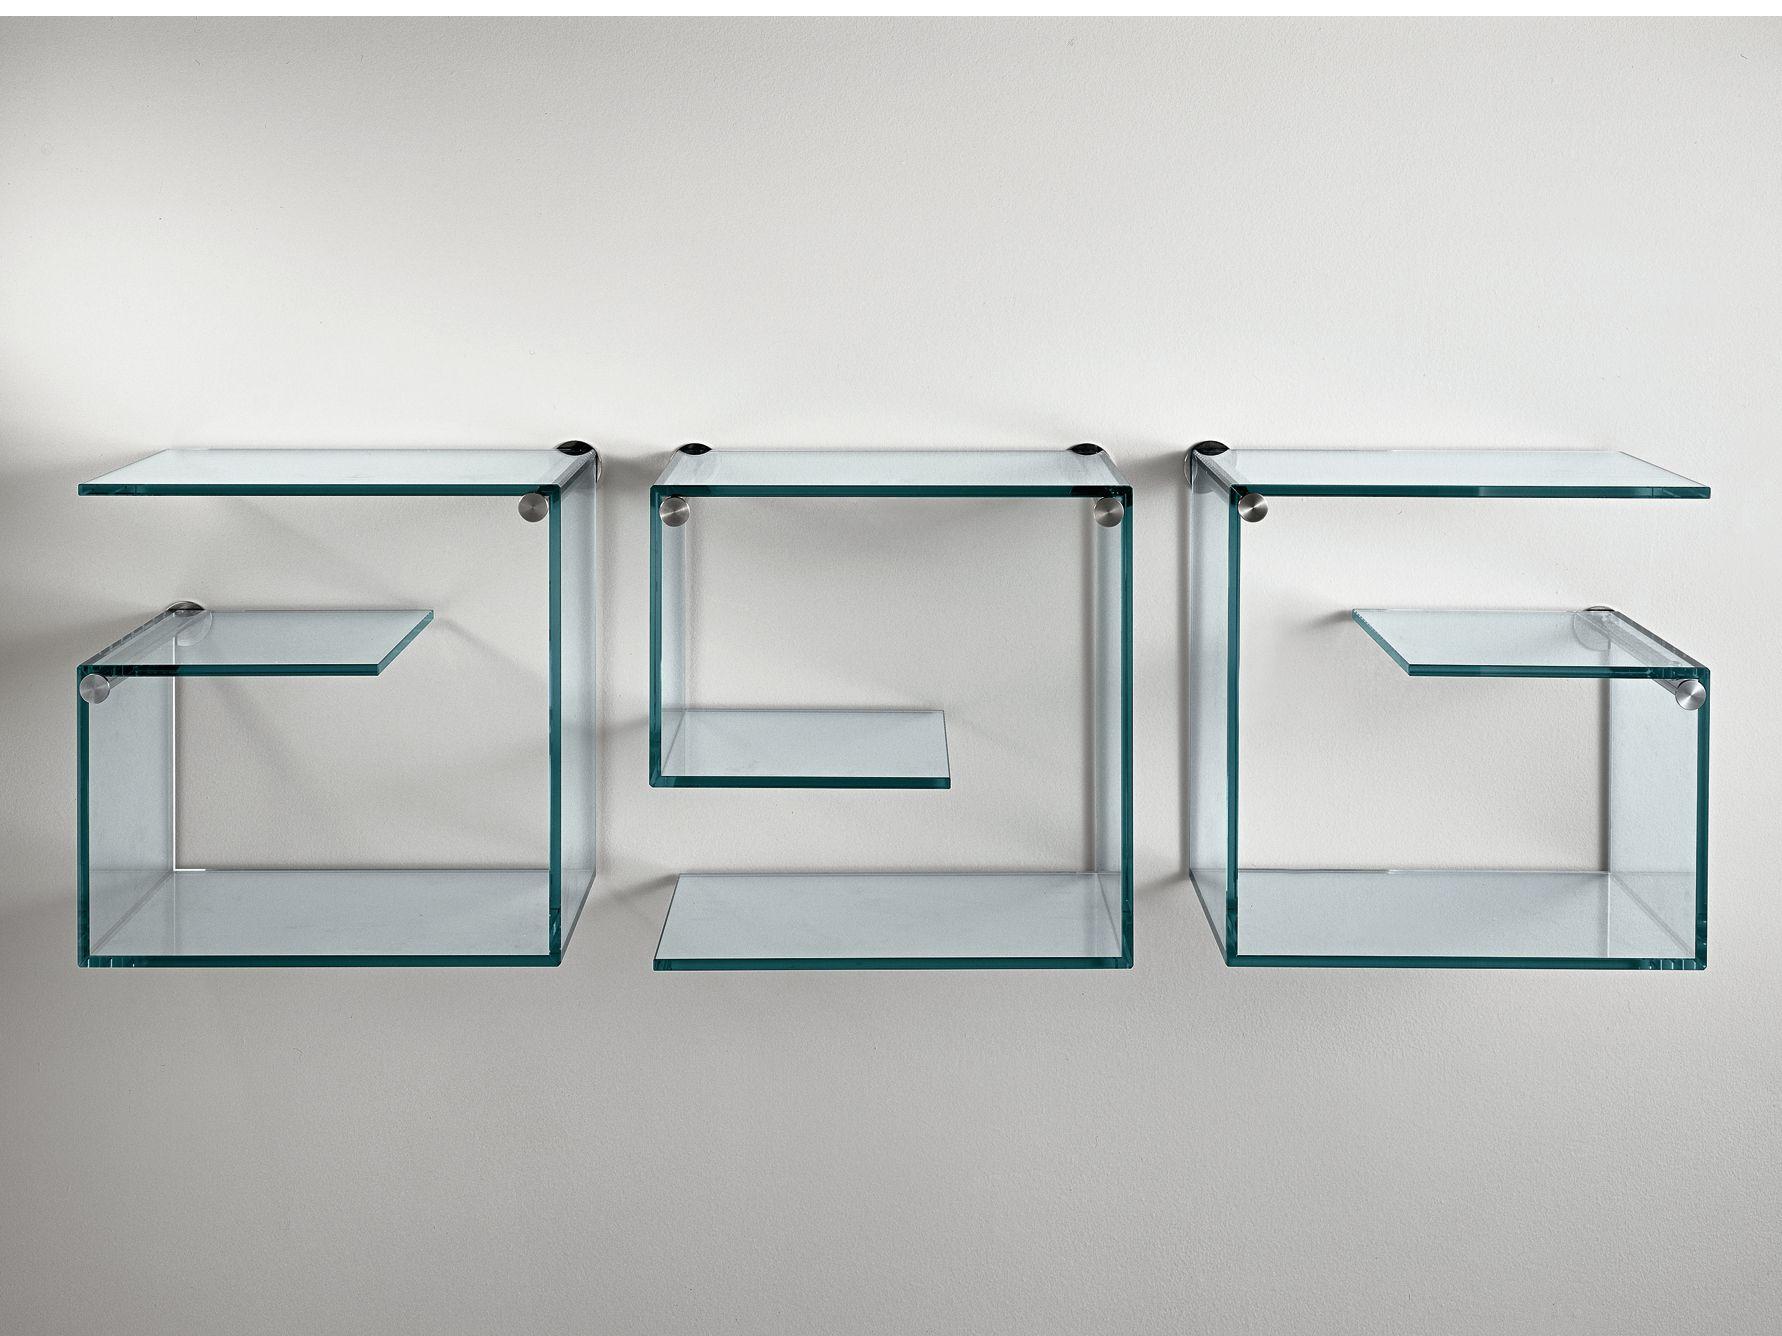 biblioth que murale en verre alfabeta by t d tonelli. Black Bedroom Furniture Sets. Home Design Ideas